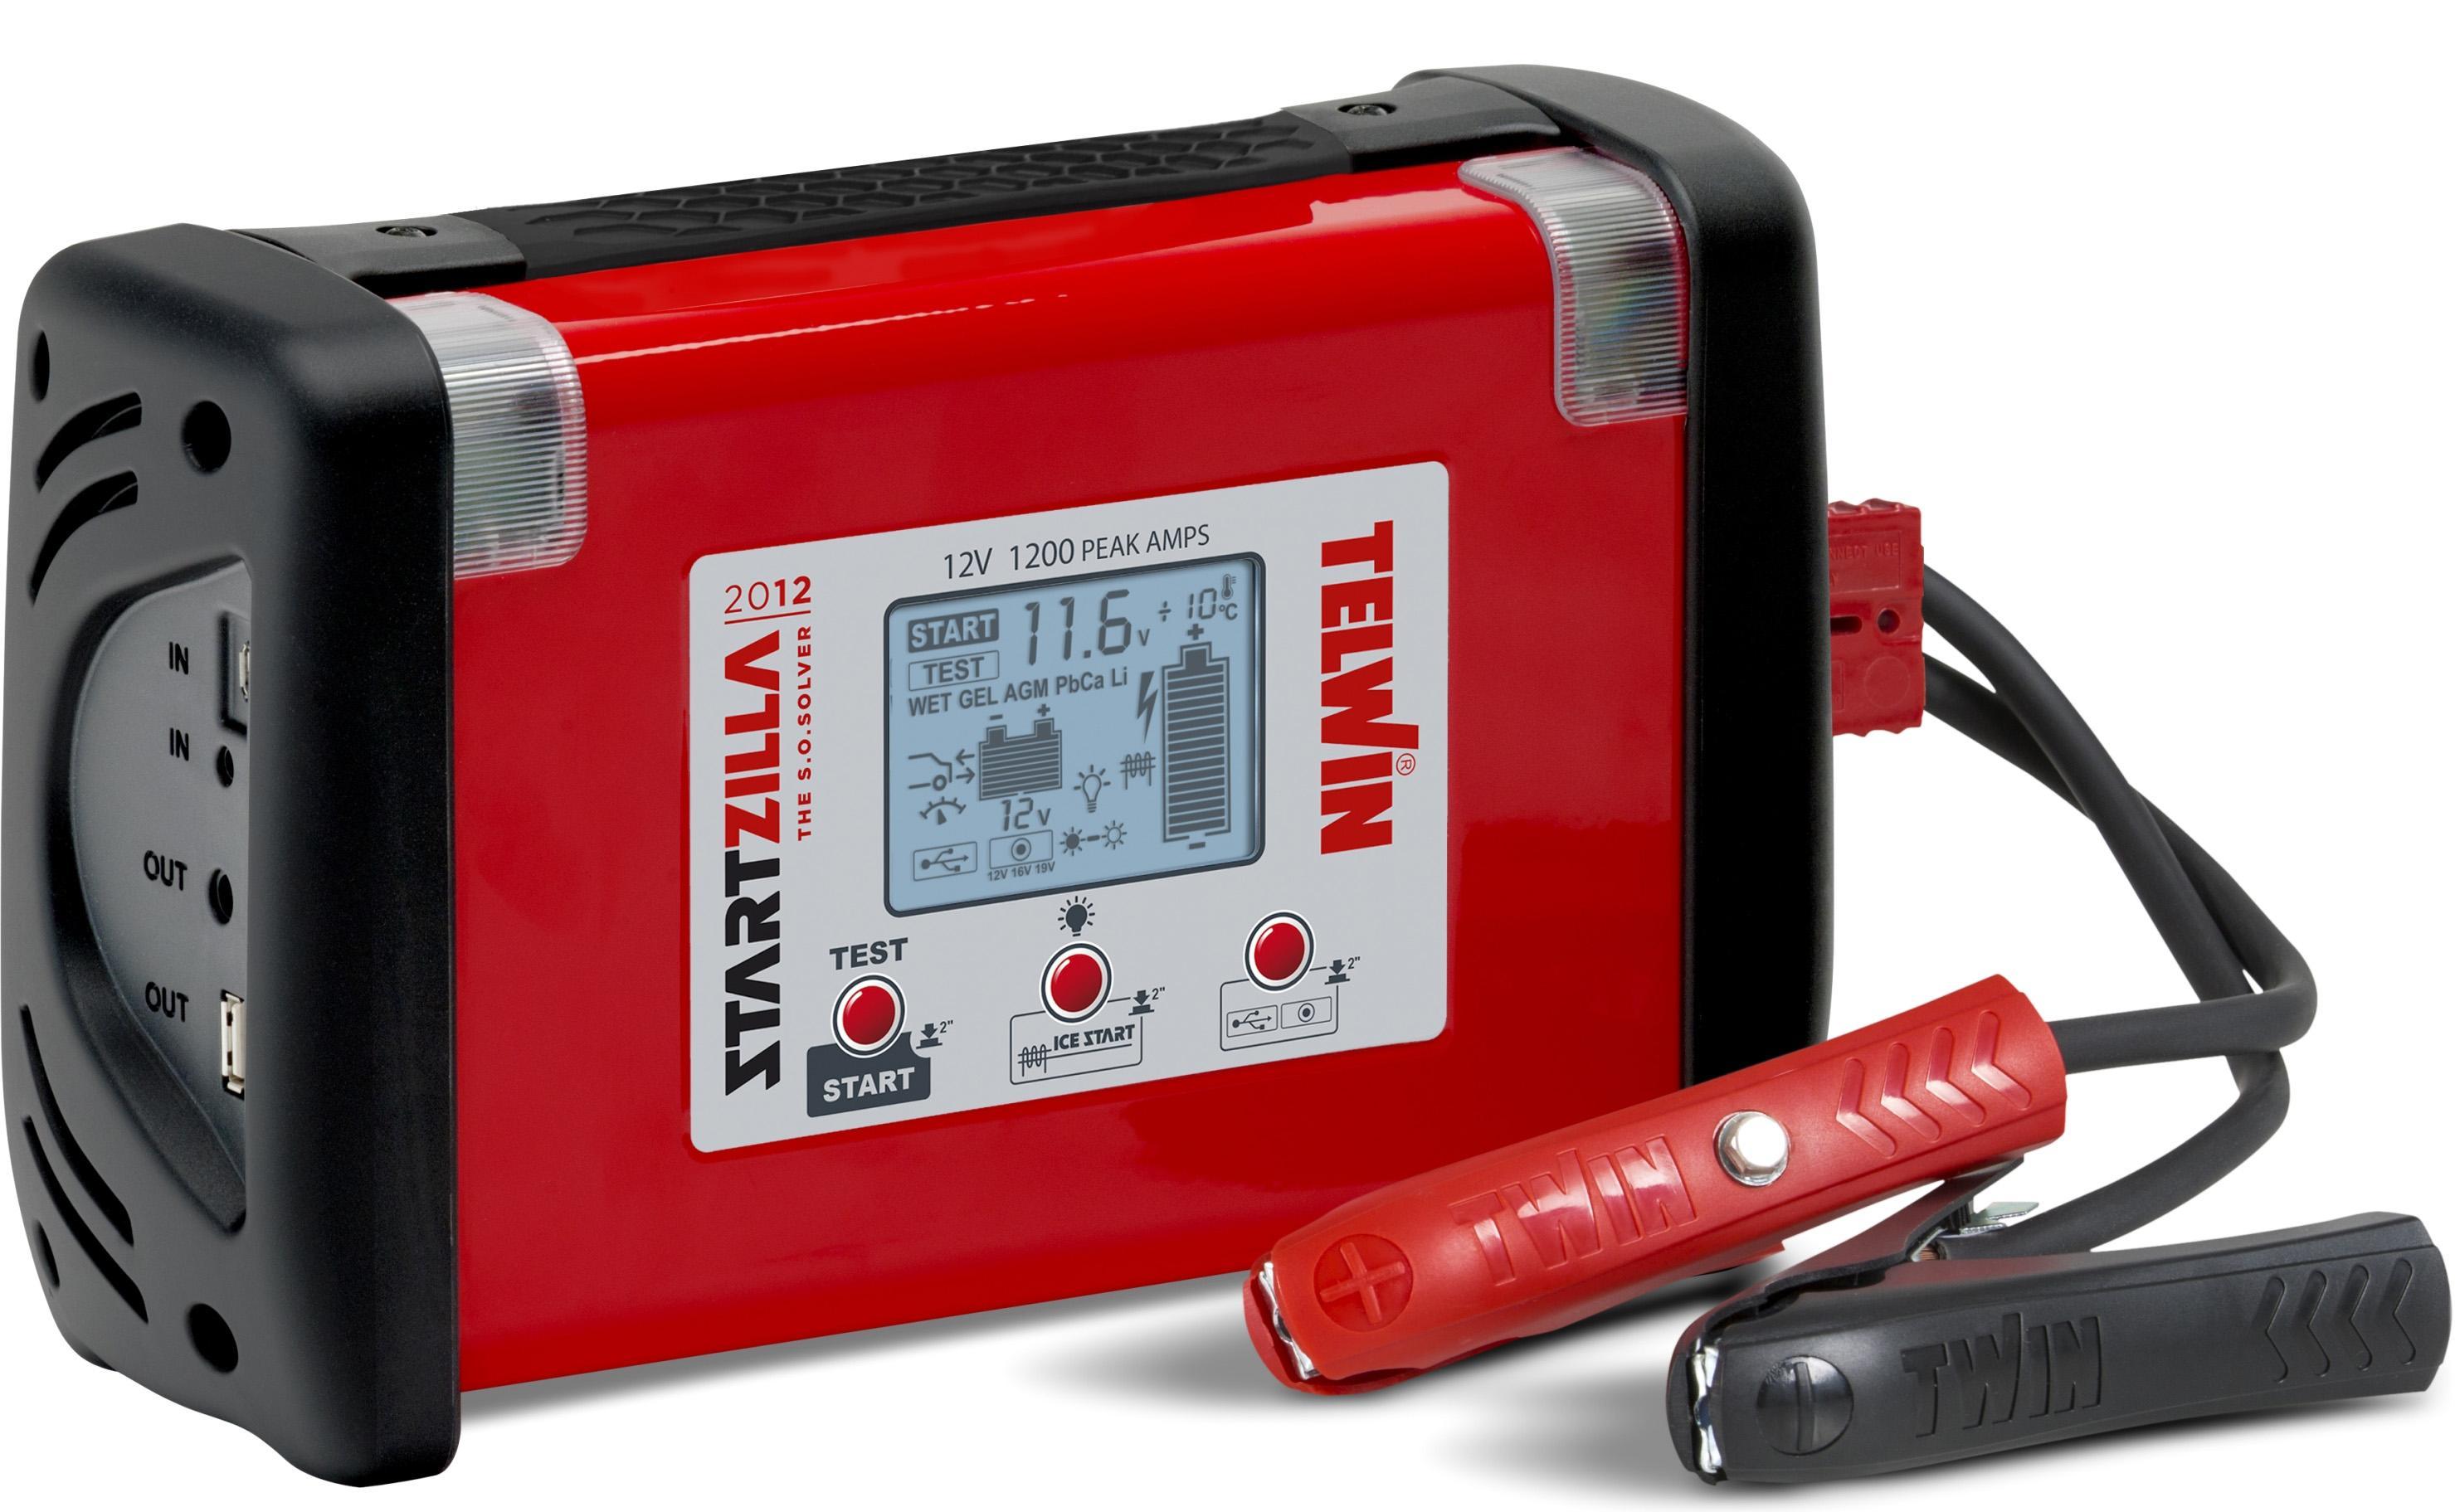 Устройство пусковое Telwin Startzilla 2012 12v (829521) для автомобиля класса лада аккумулятора какой нужен